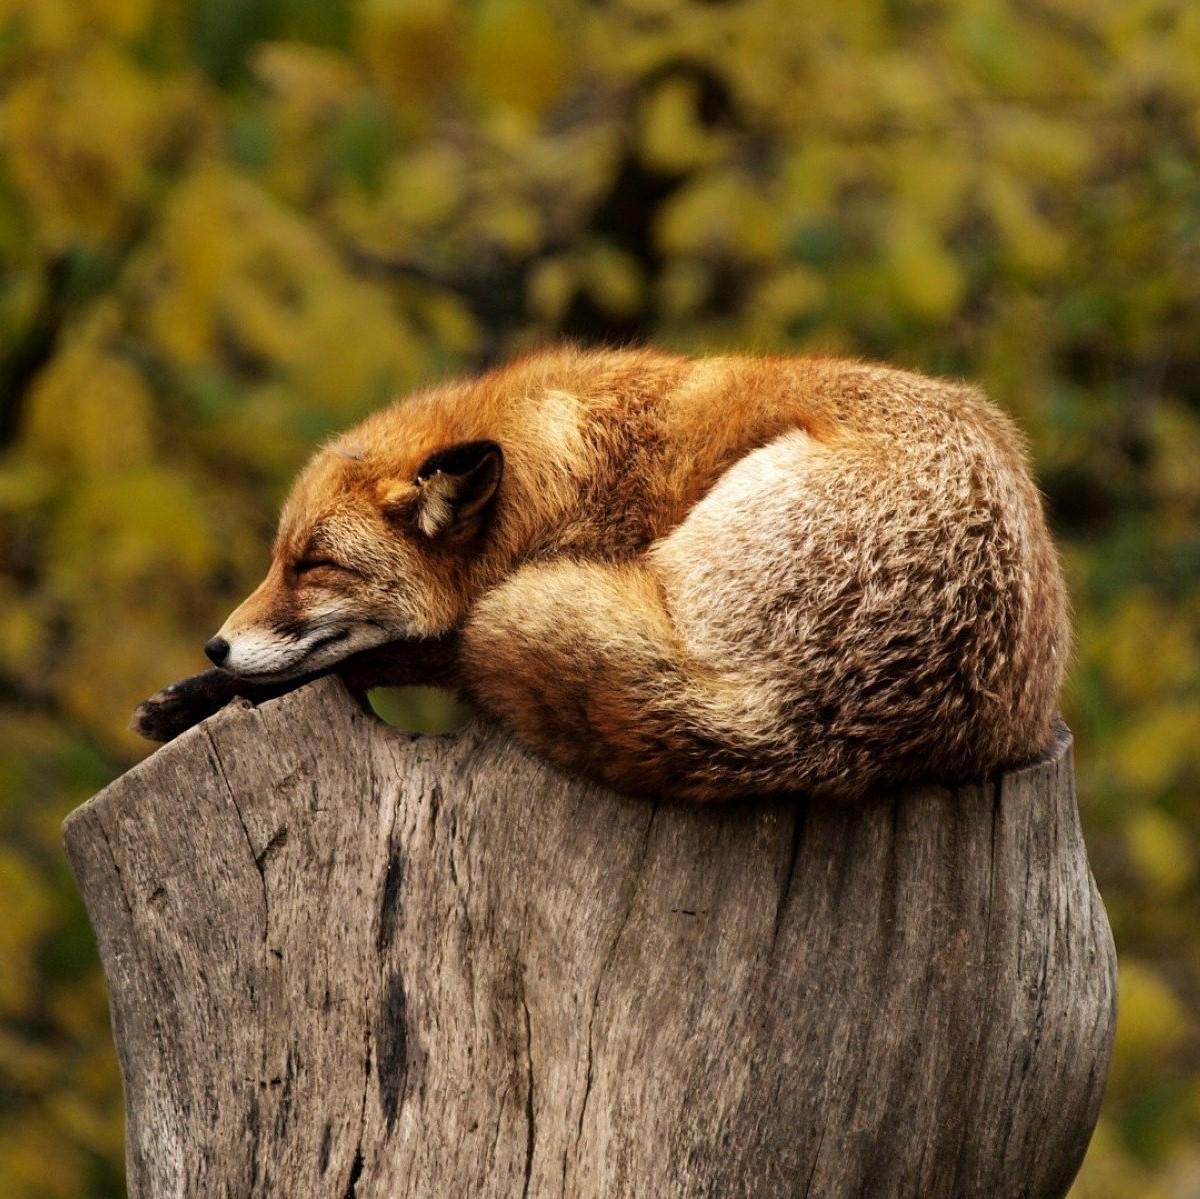 https://www.hladinaalfa.cz/wp-content/uploads/2019/11/fox_s.jpg